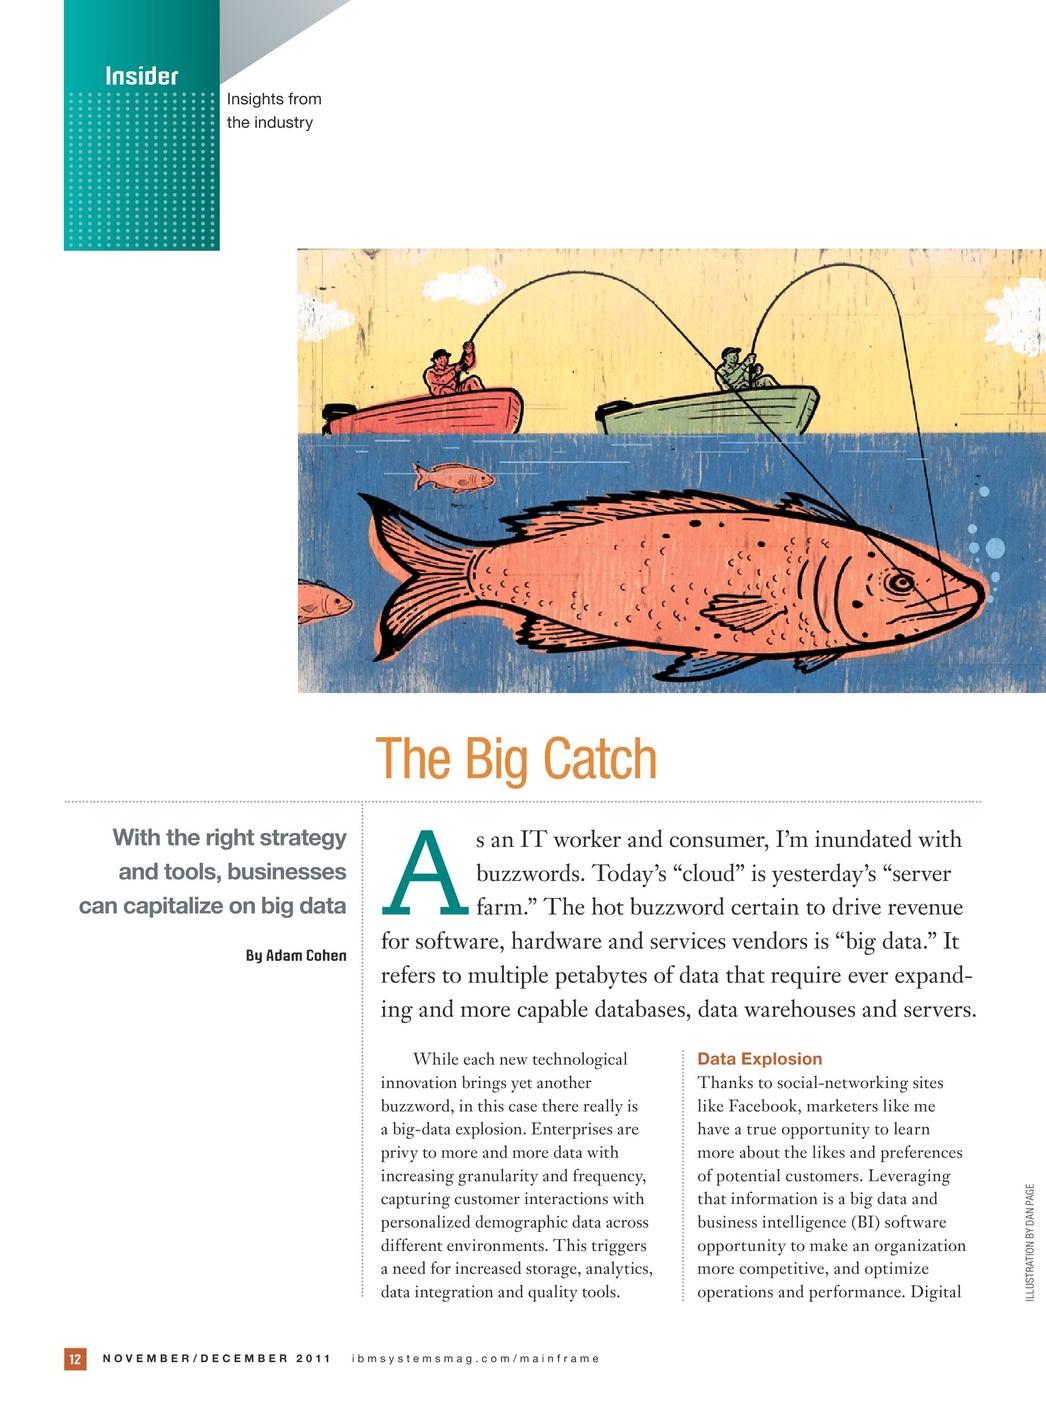 IBM Systems Magazine, Mainframe Edition - November/December 2011